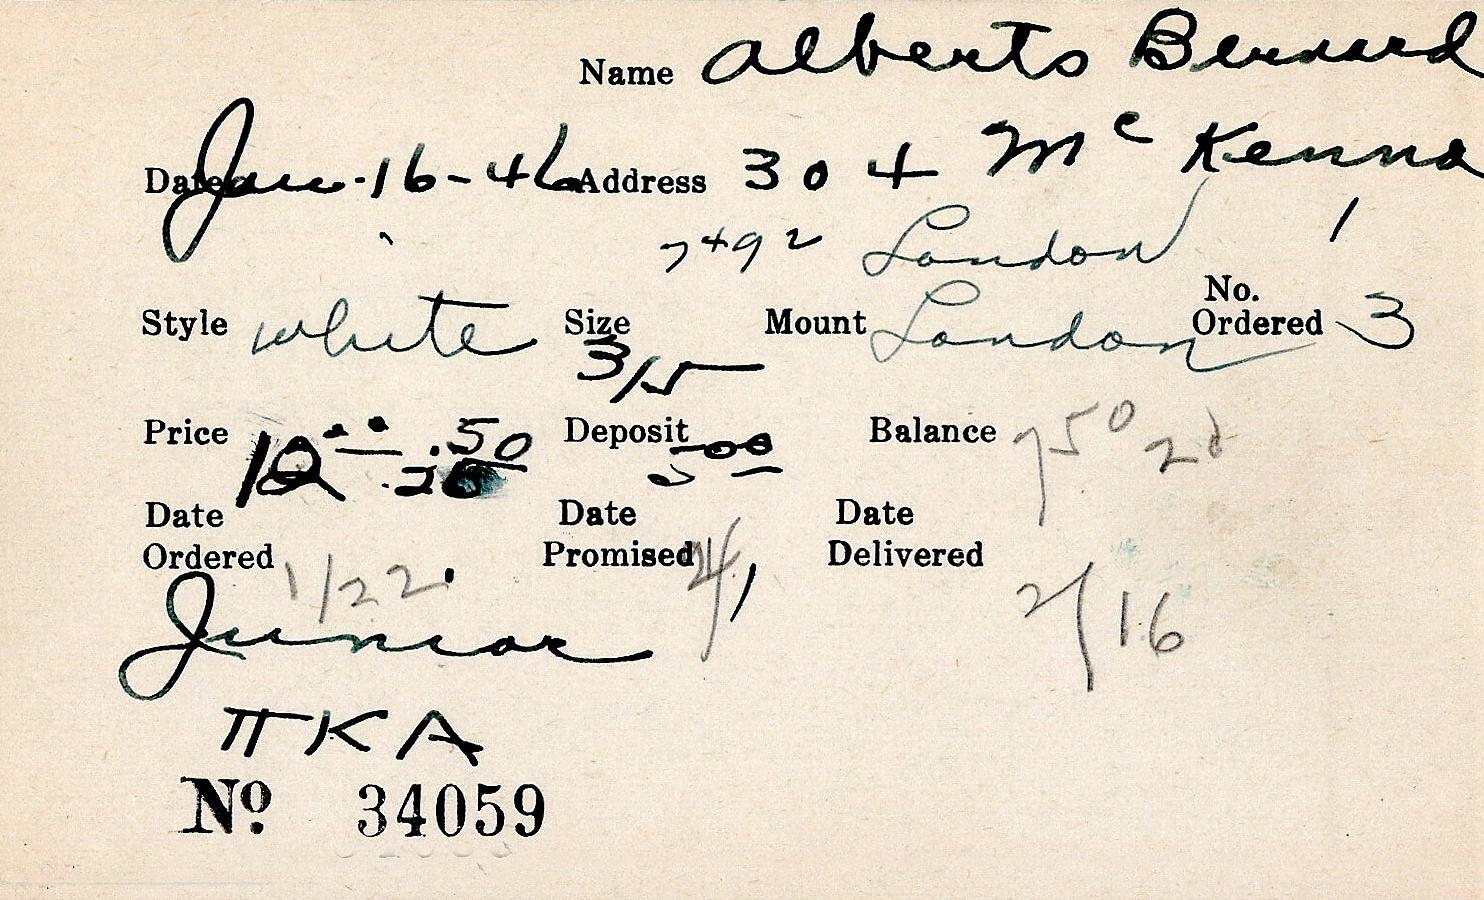 Index card for Bernard Alberts